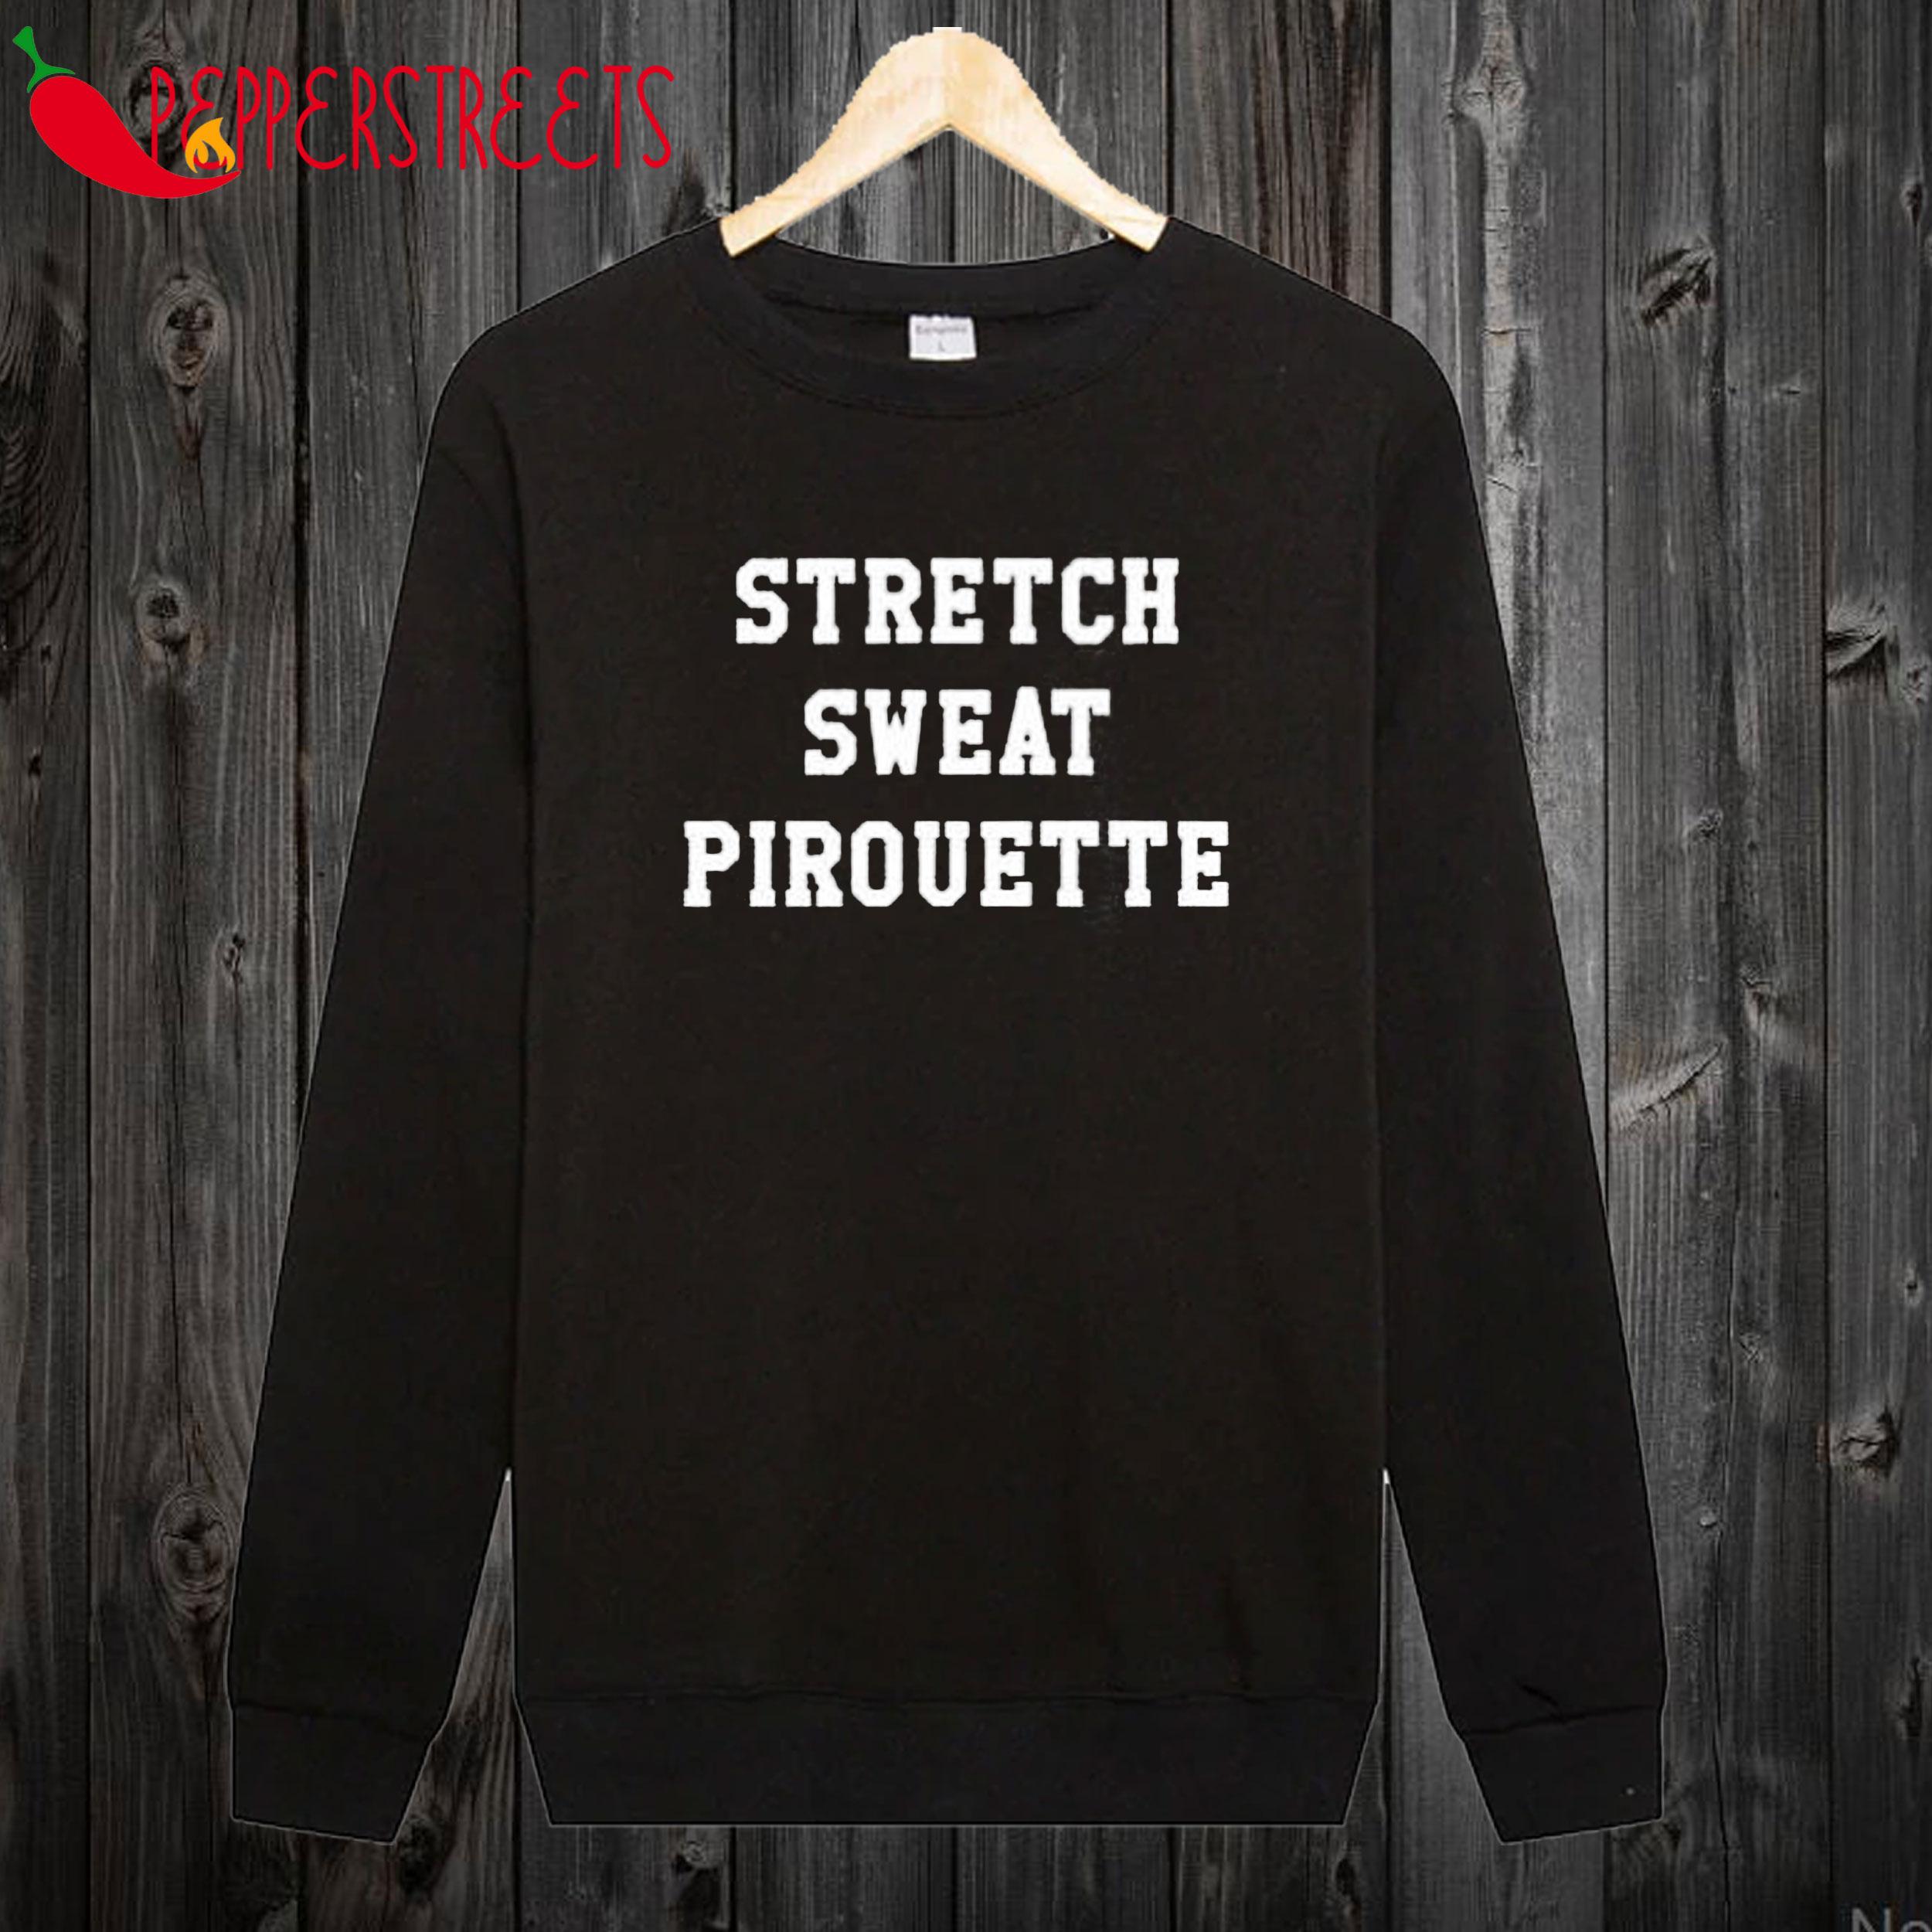 Stretch Sweat Pirouette Sweatshirt